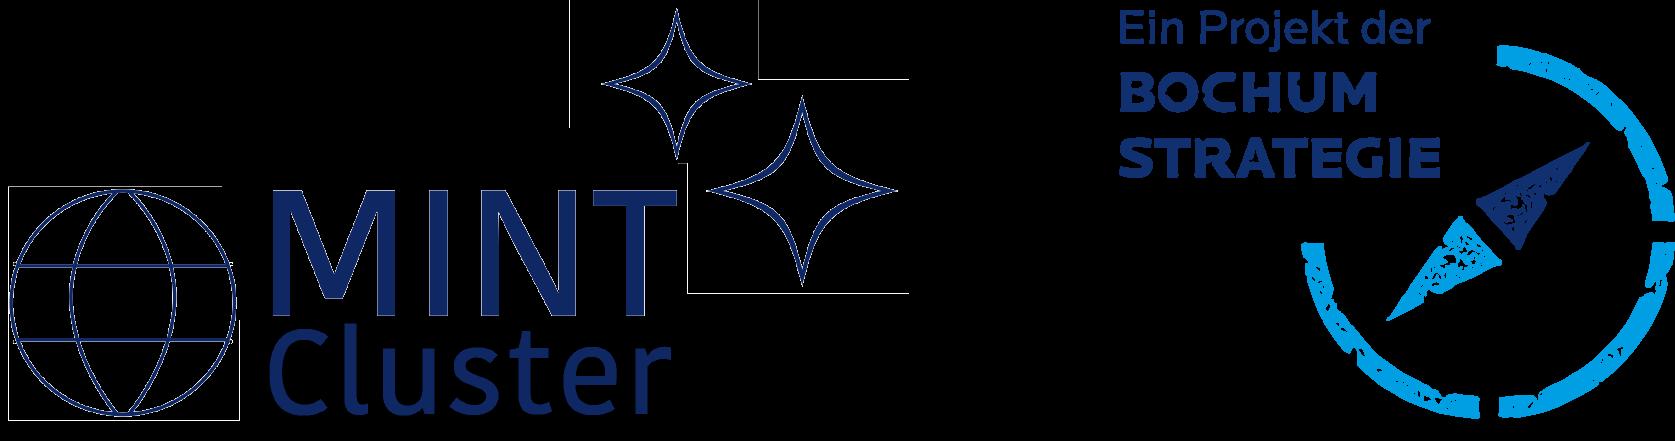 MINT-Cluster Bochum